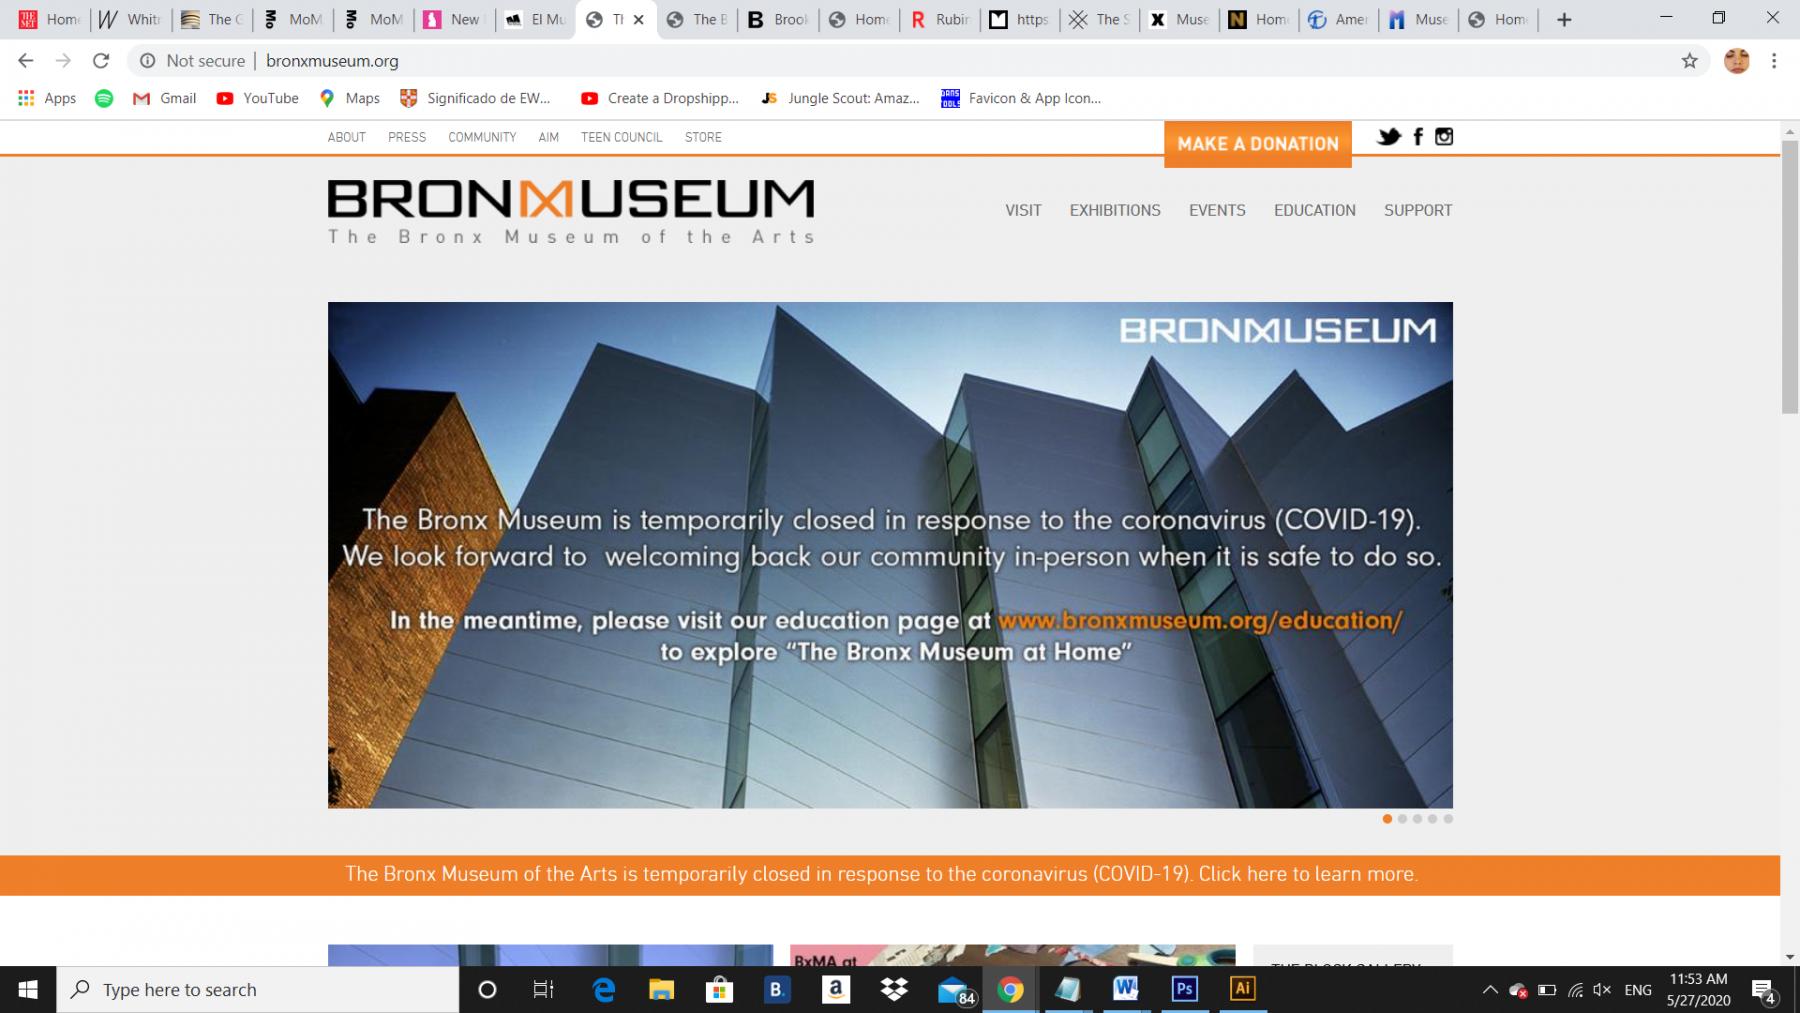 www.bronxmuseum.org-2020-Photography-Naivy-Perez